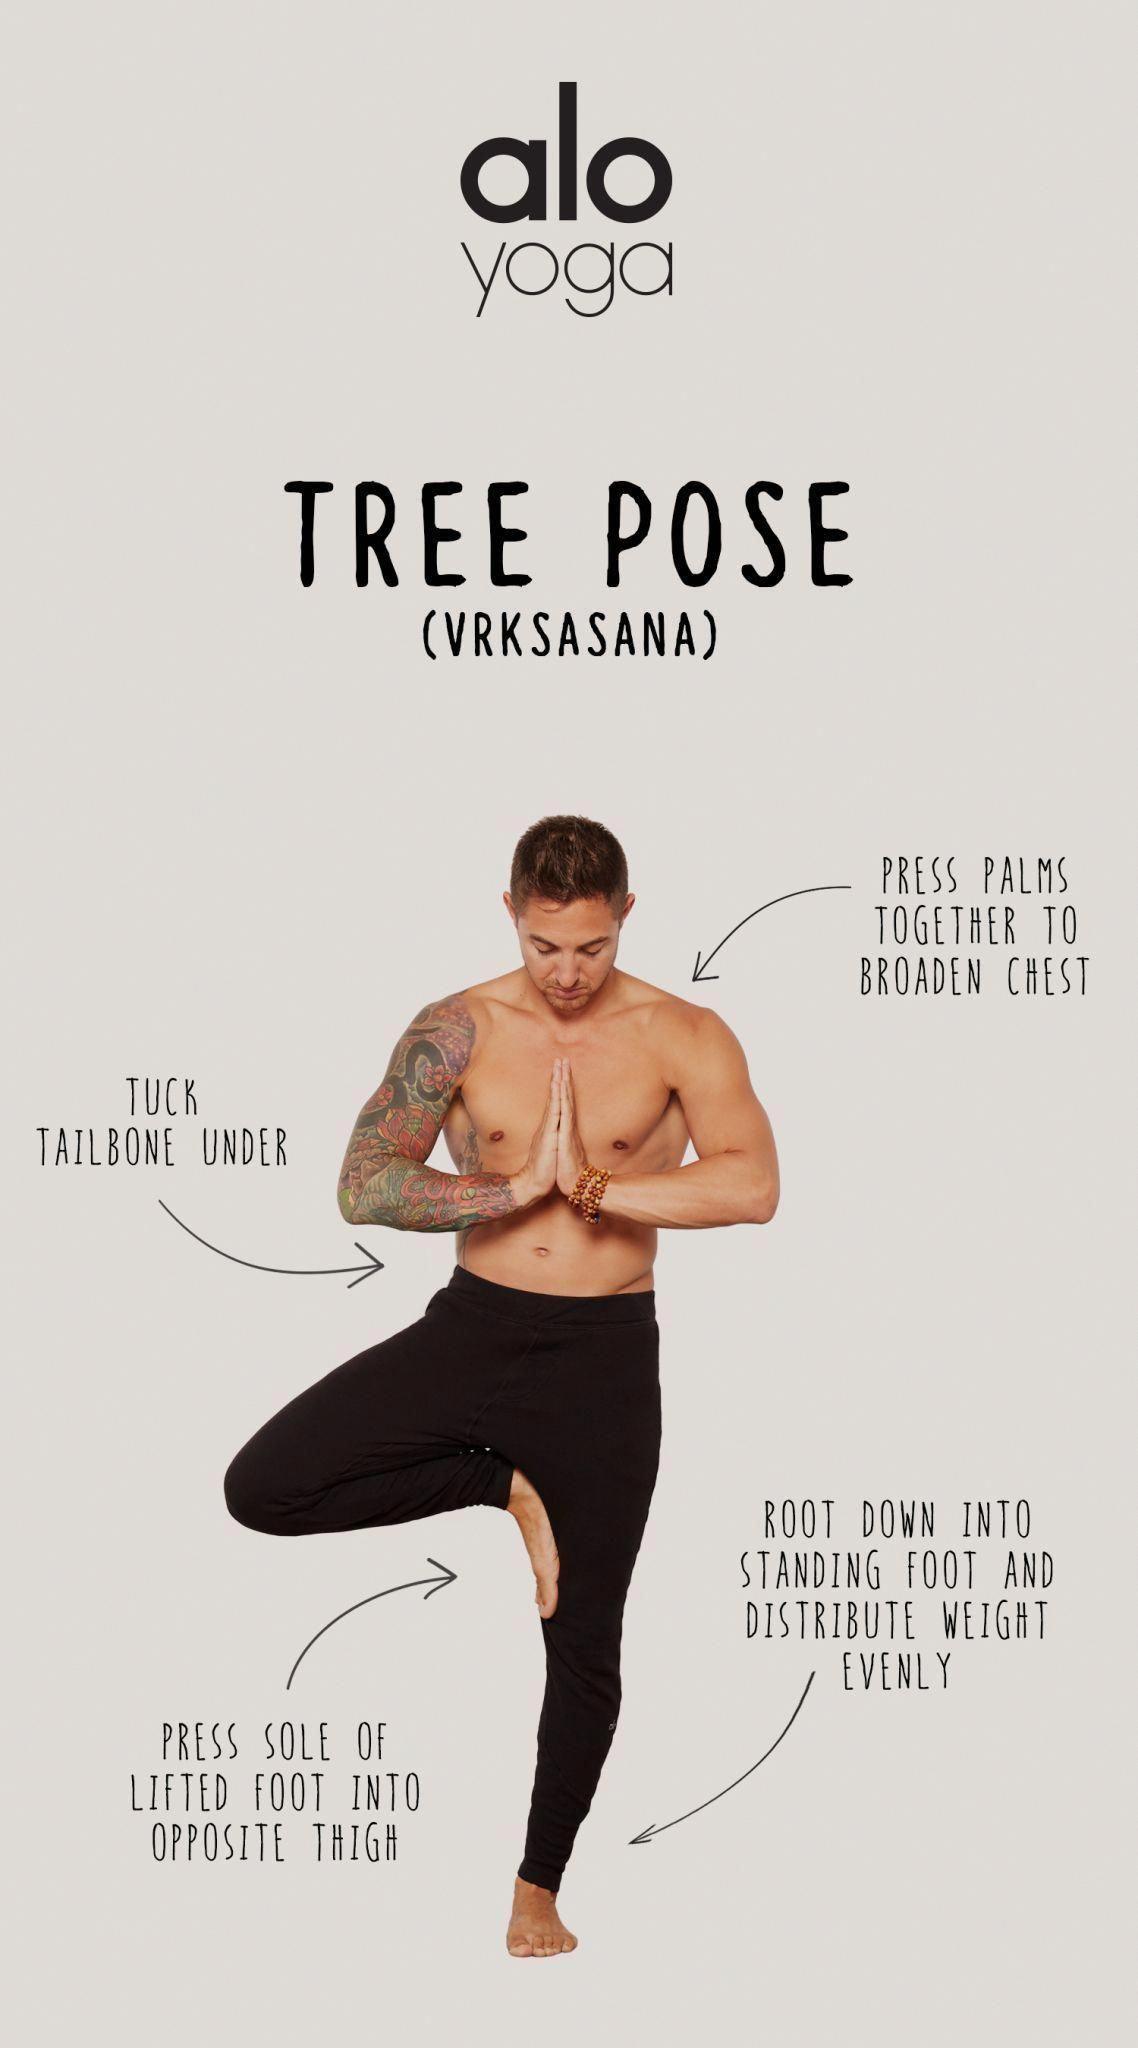 Helpful Tips For Bikram Yoga Poses Yoga Poses For Men Yoga For Beginners Yoga For Men